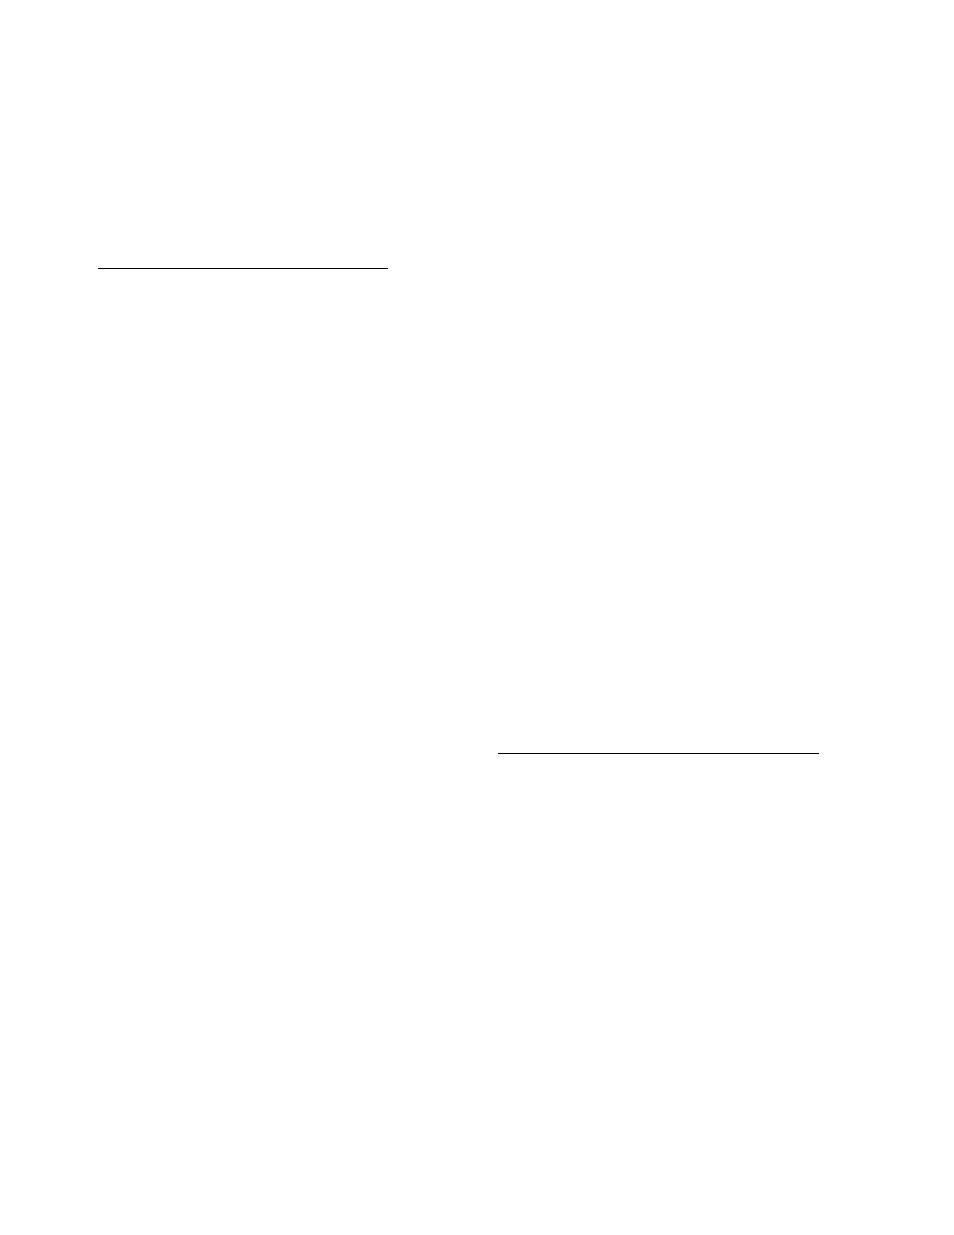 Cub Cadet 7254 User Manual   Page 37 / 52